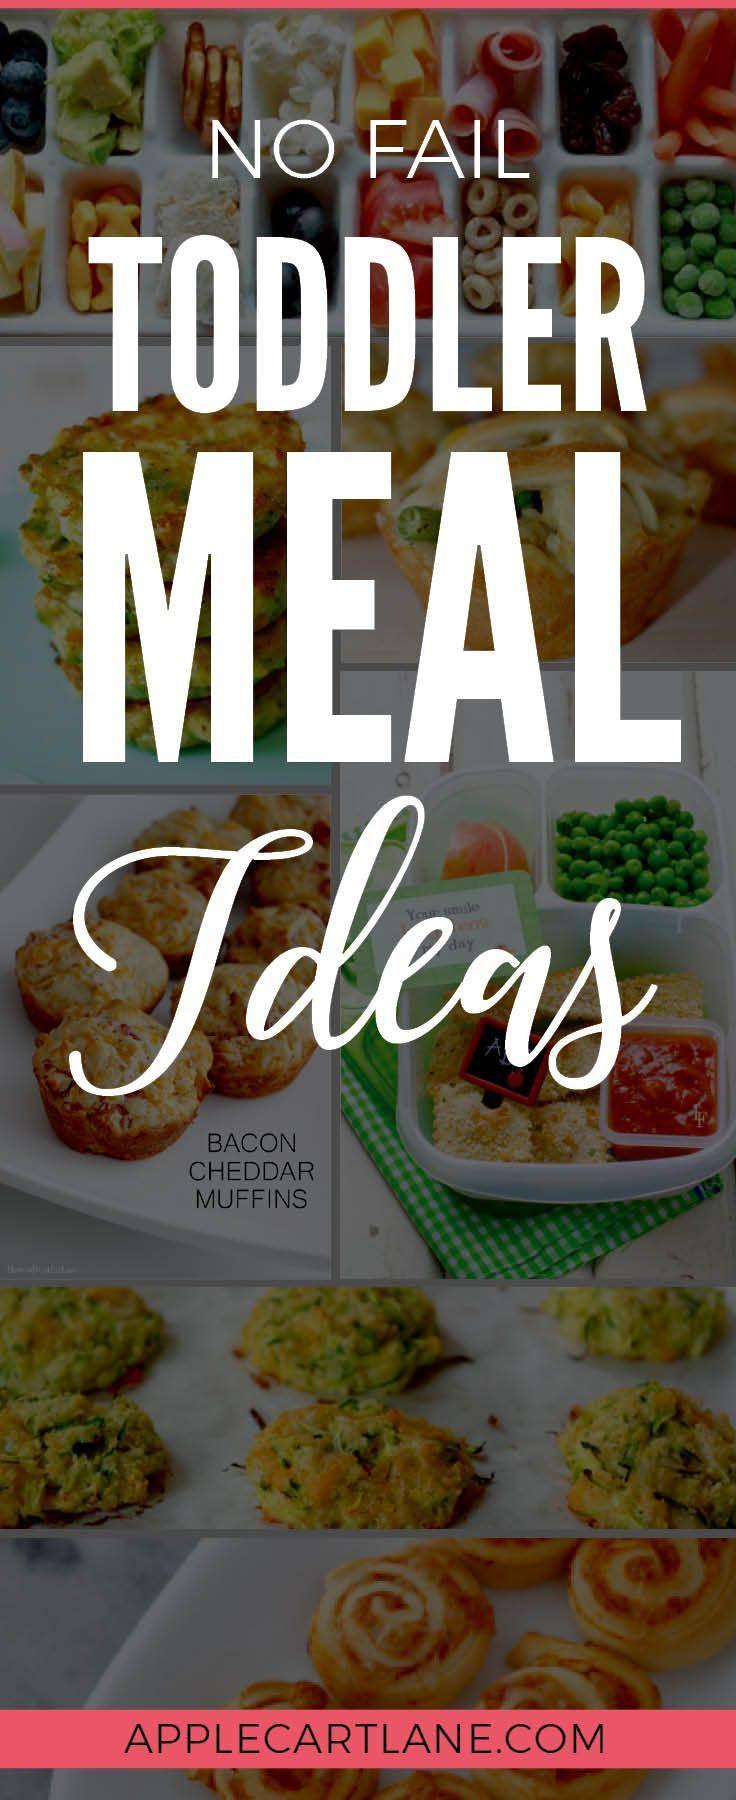 10 Toddler Meal Ideas That Make Time Fun Again